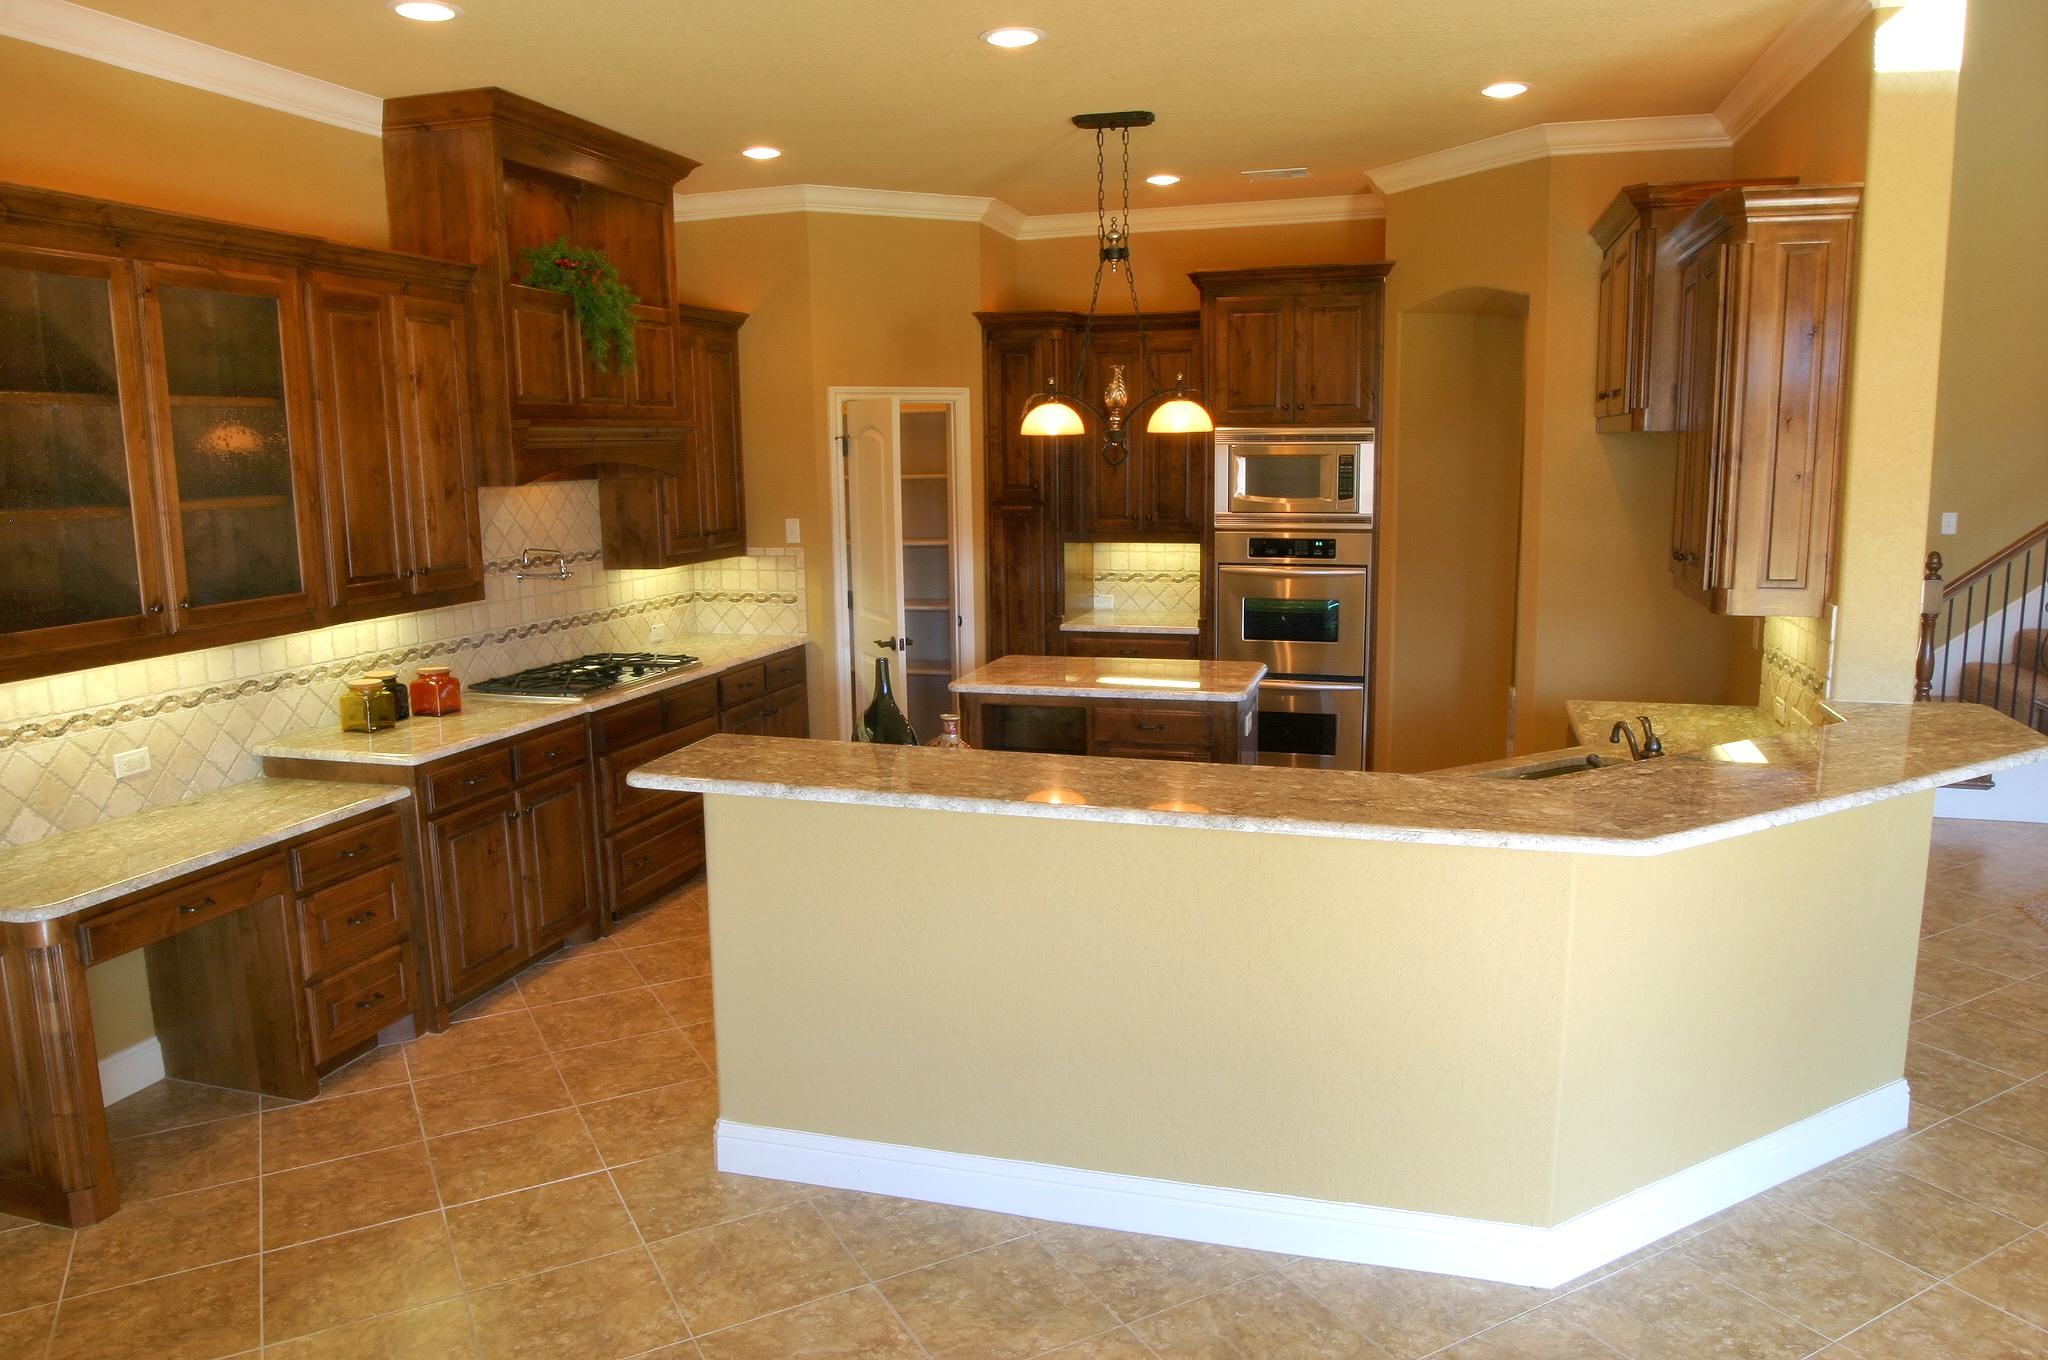 New kitchen small appliances for 2014 -  Kitchen Small Appliances Photo 6